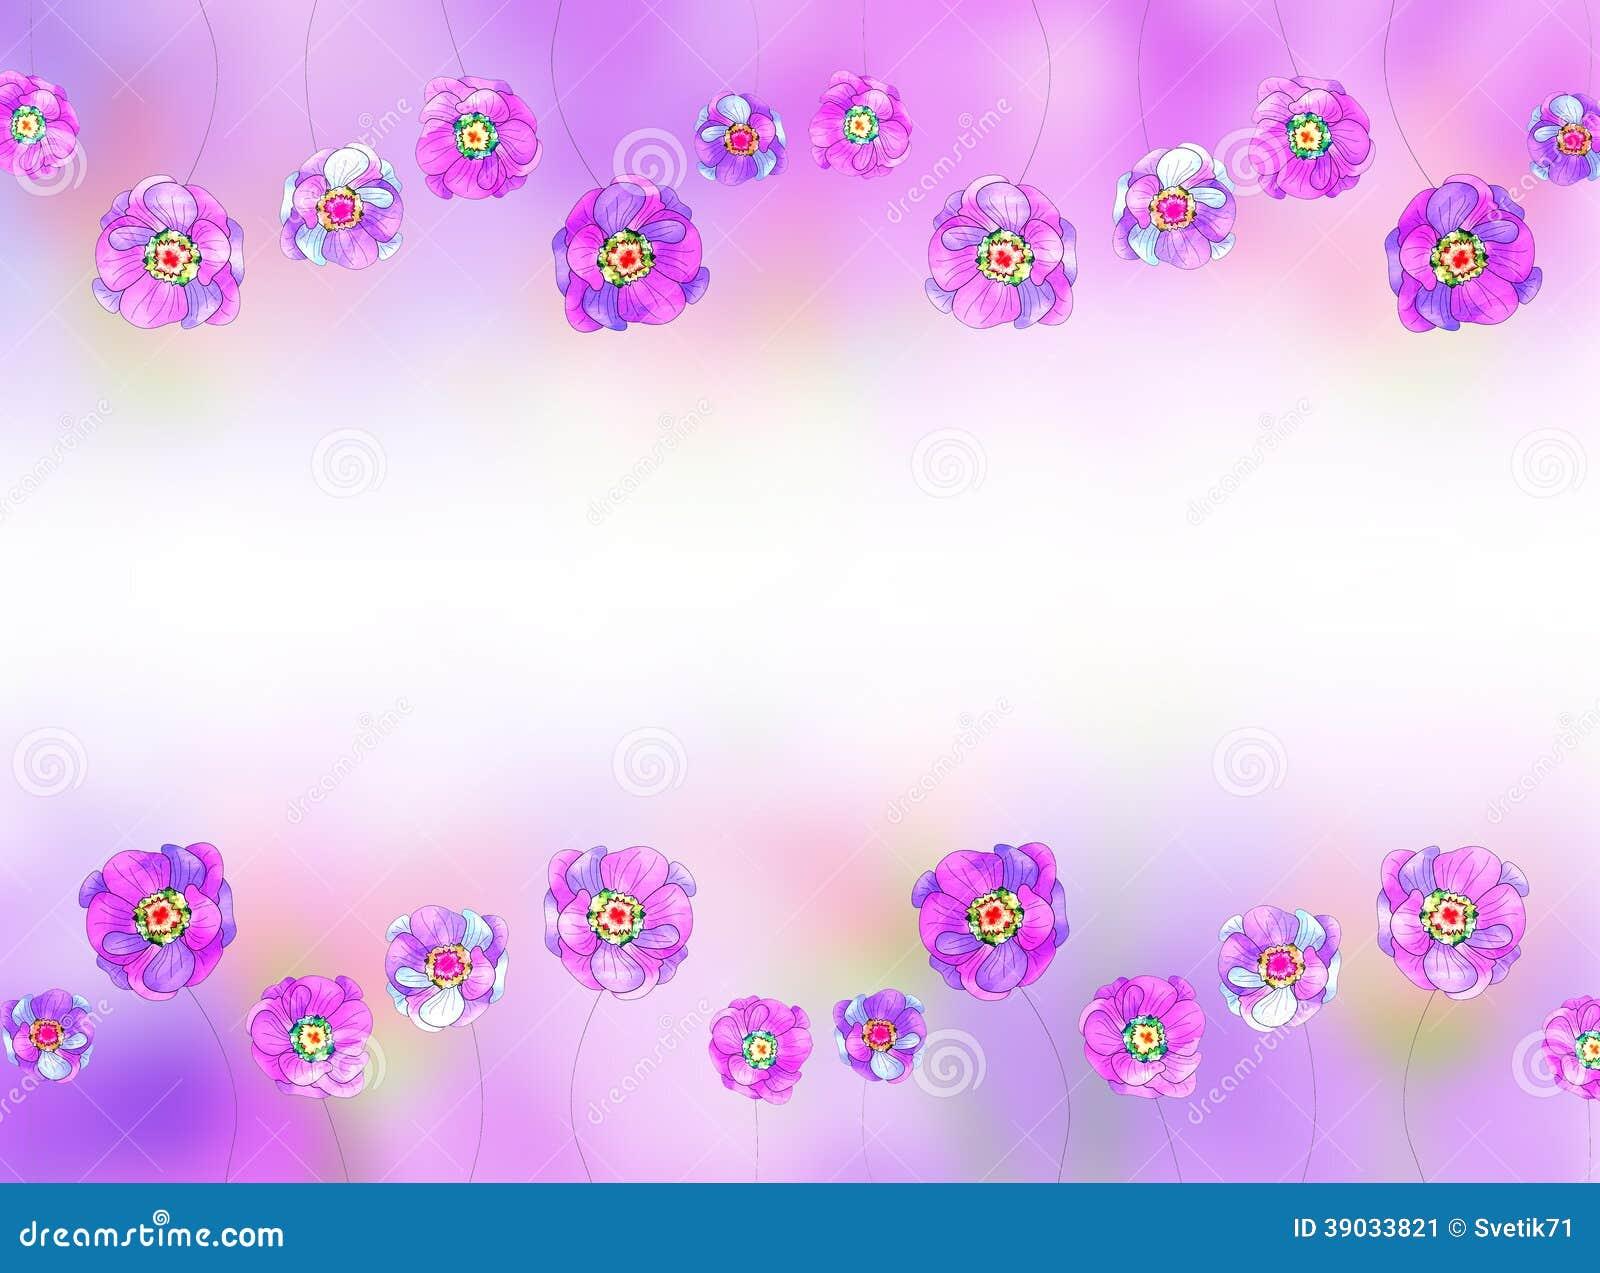 Flores Lilas Con Rosas Sobre Fondo: Fondo De La Lila Con Un Modelo De Flores Stock De